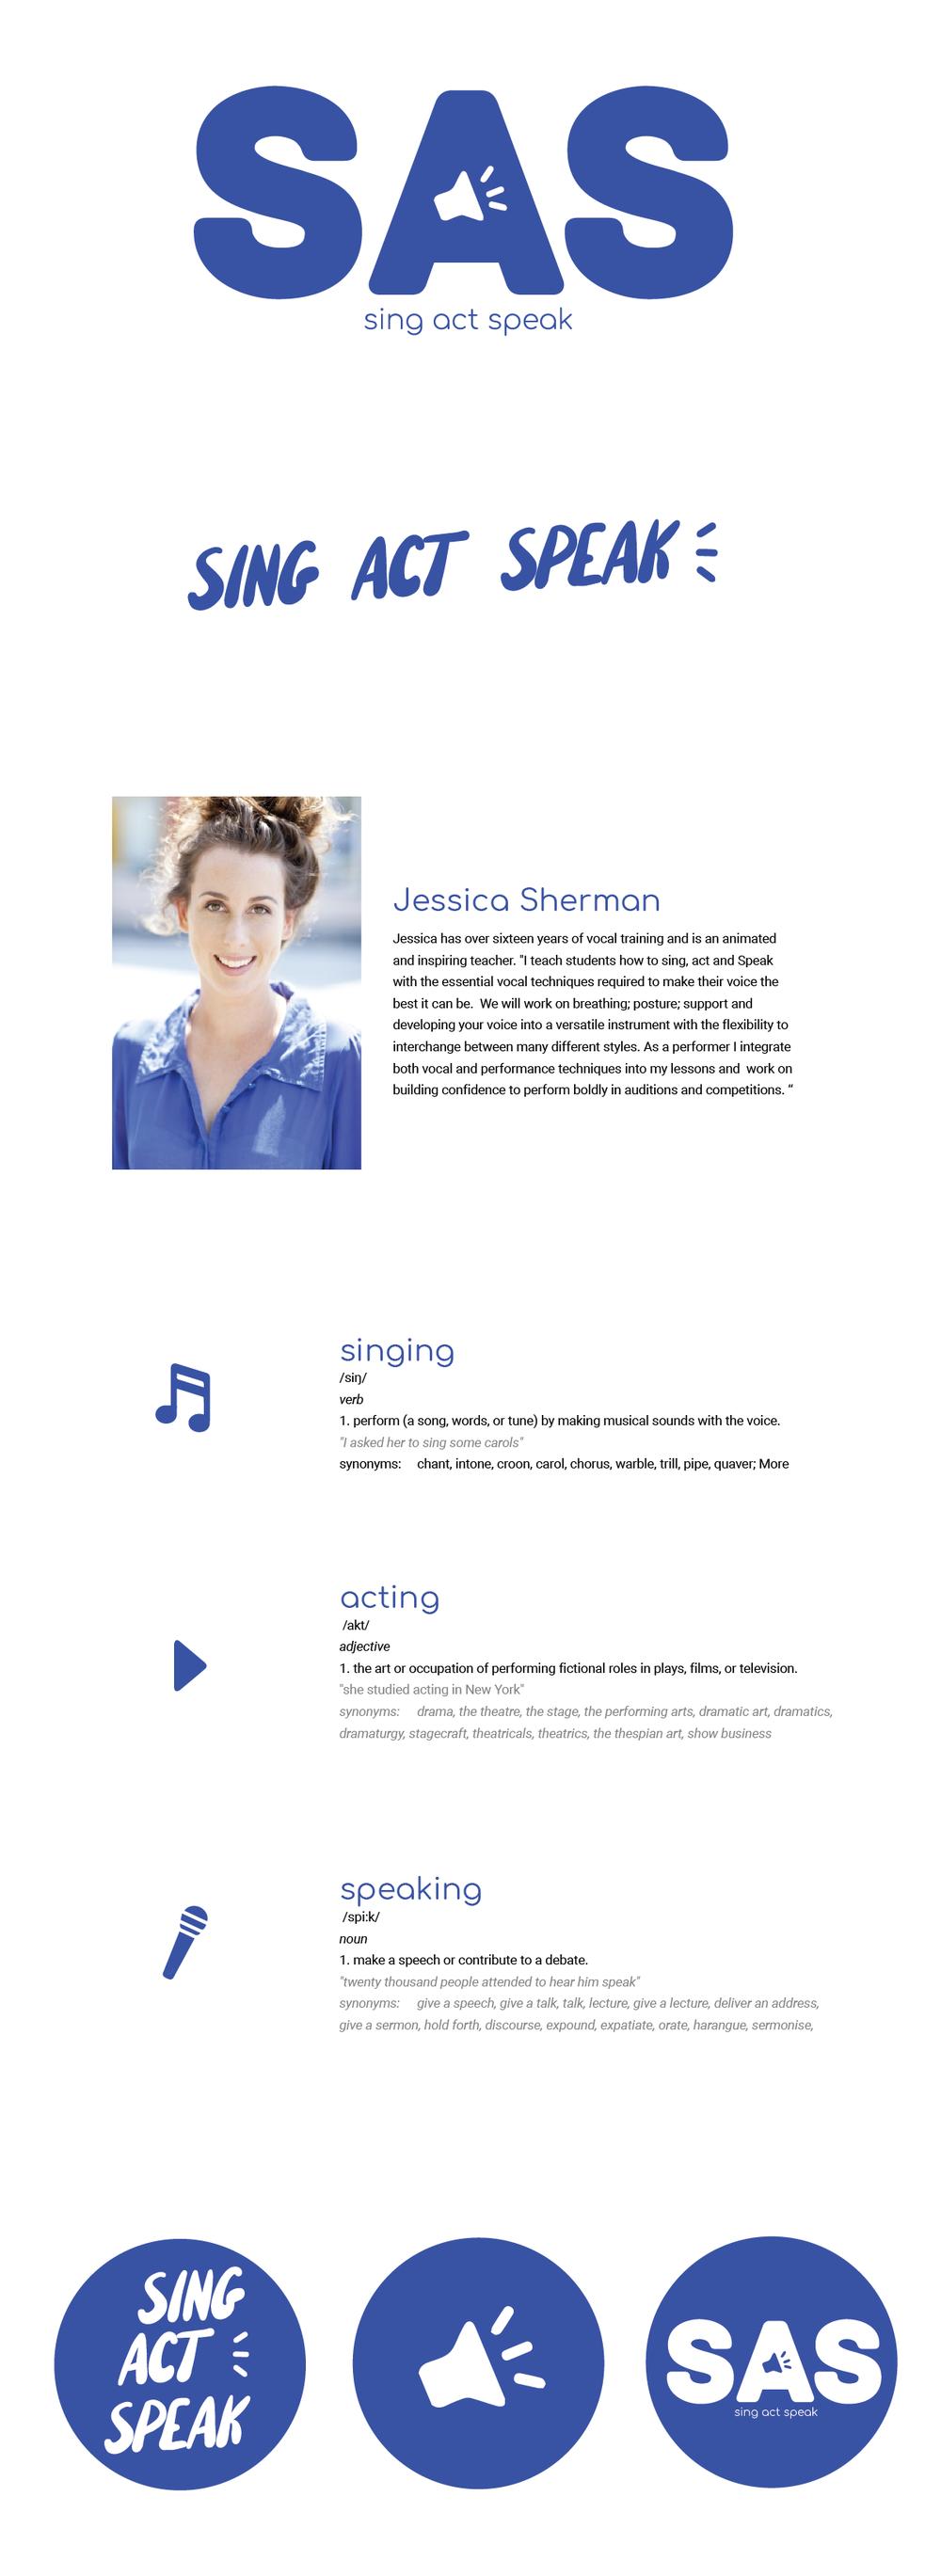 Sing-Act-Speak-Torquay-branding-website-design-imo-creative.png